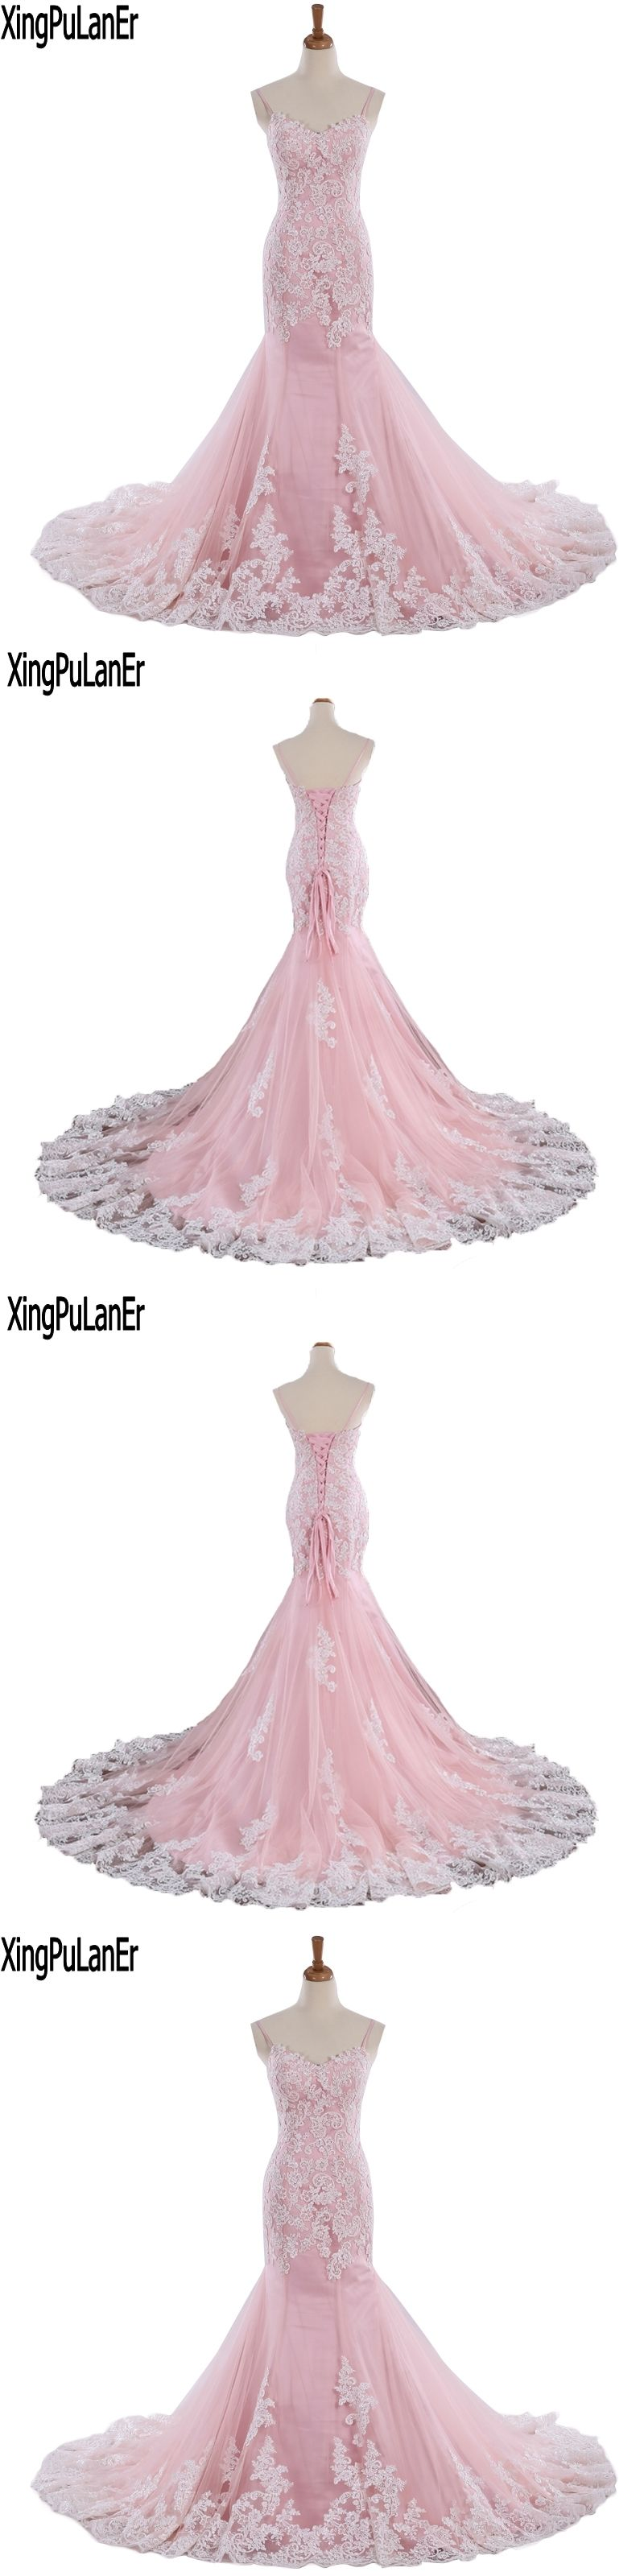 Robe de soiree vintage spaghetti strap sweetheart white lace